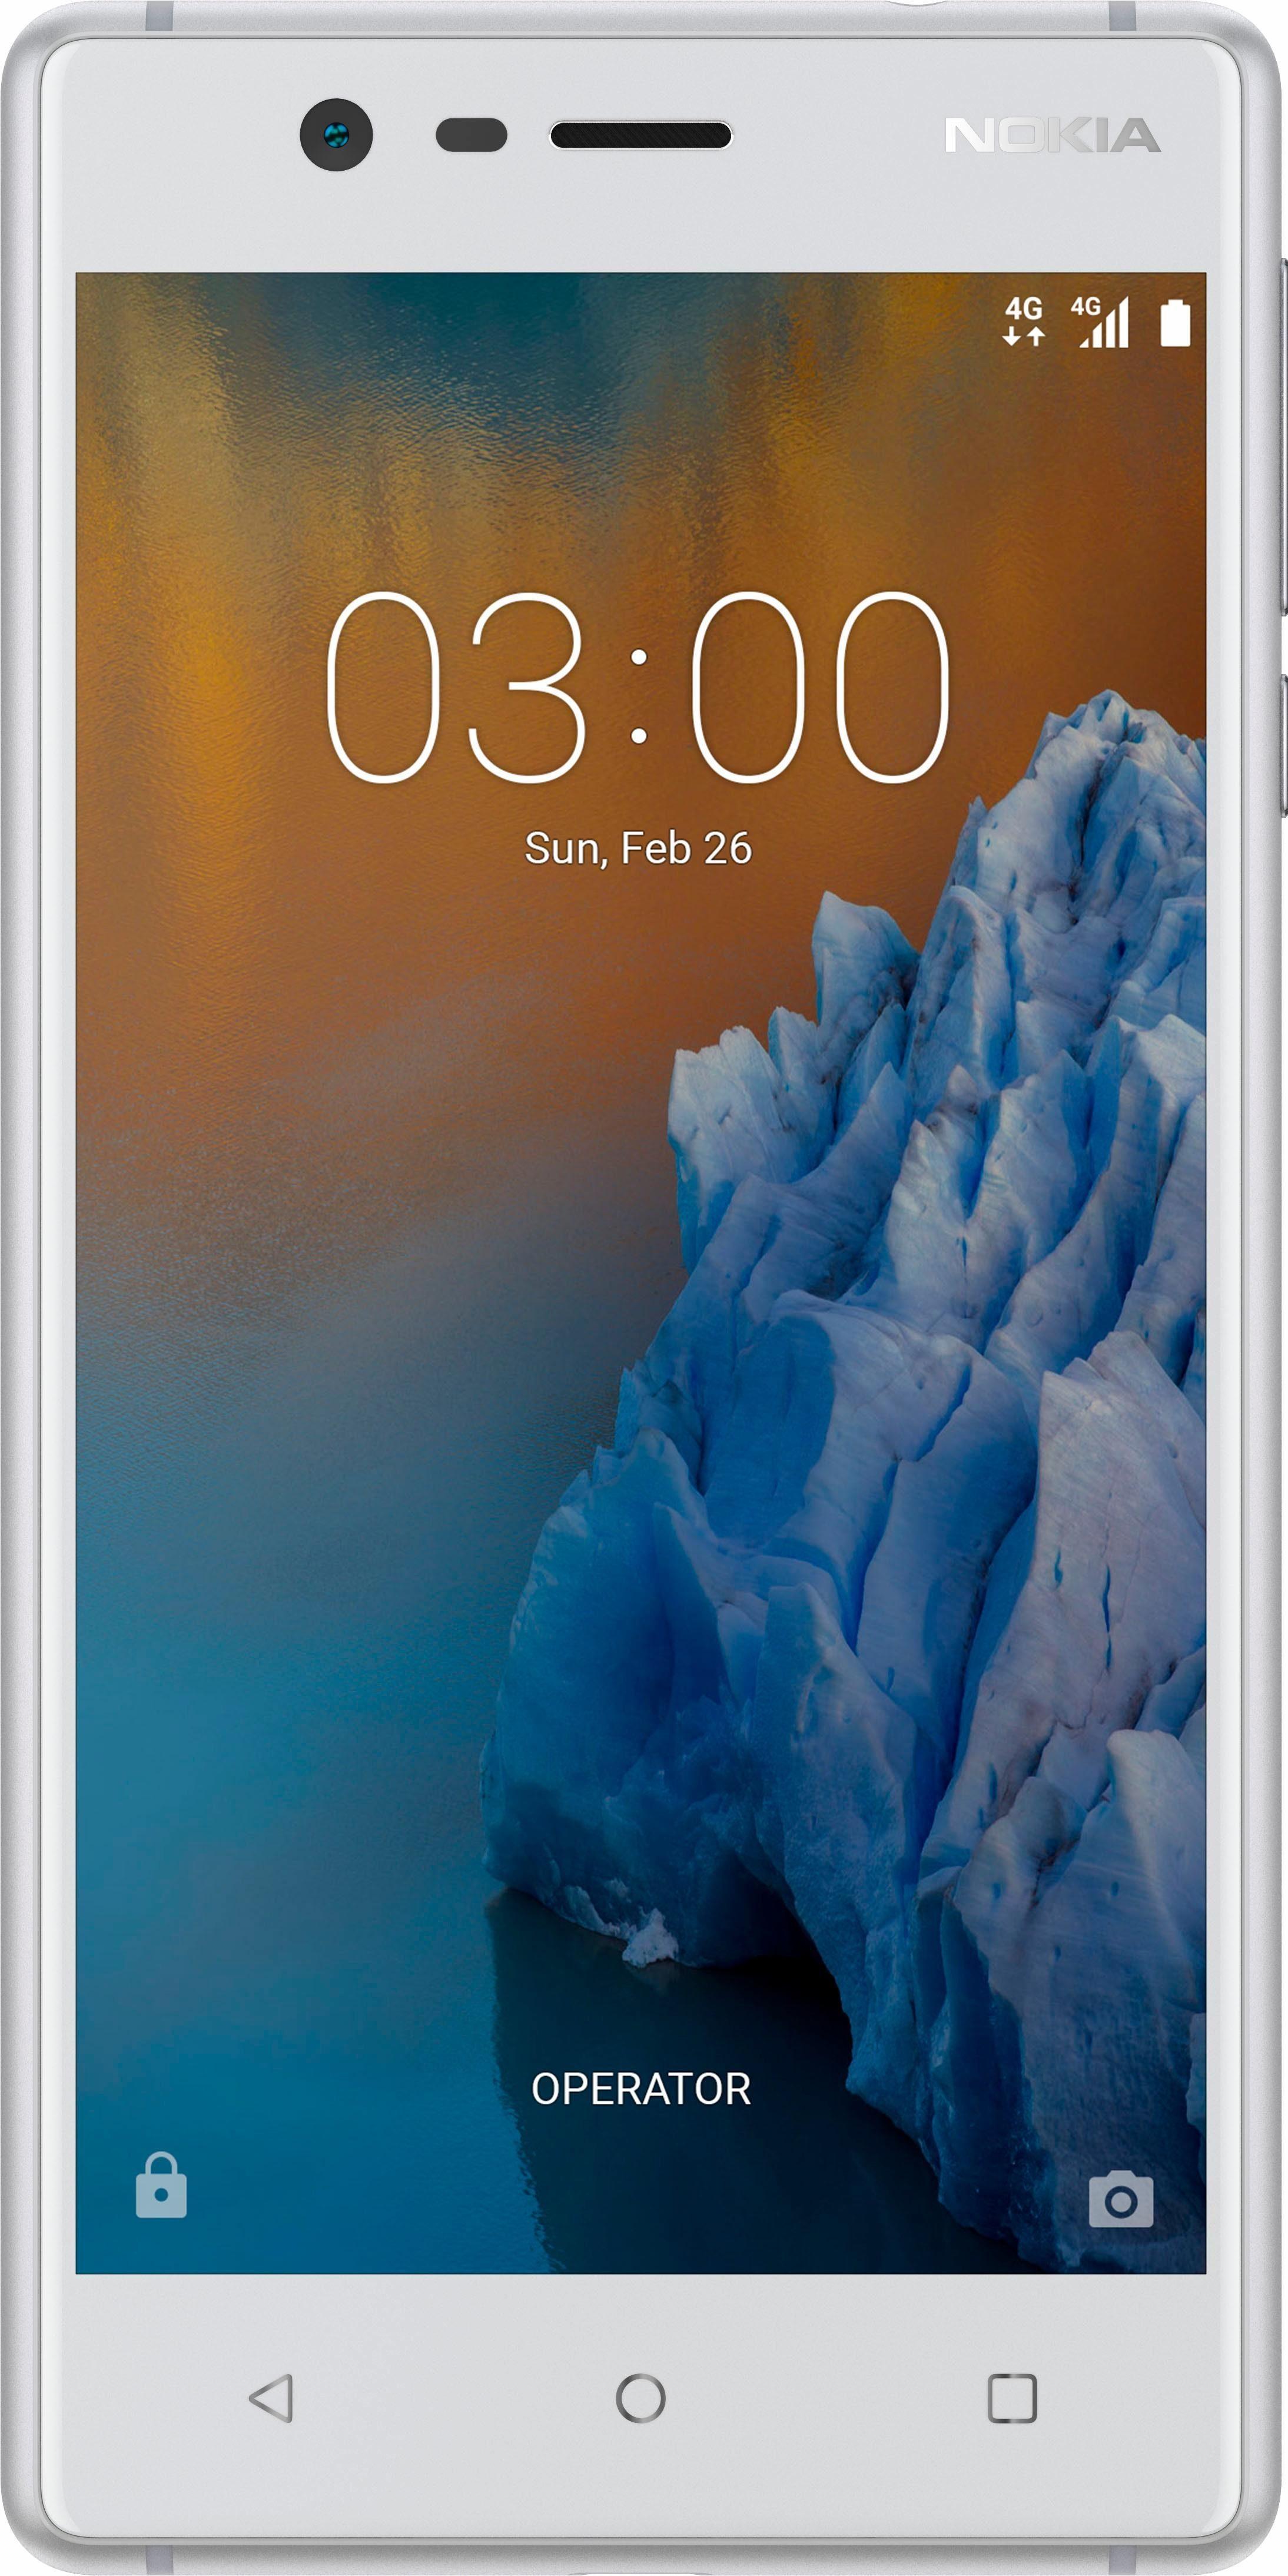 Nokia 3 Dual SIM Smartphone, 12,7 cm (5 Zoll) Display, LTE (4G), Android 7.0 (Nougat), 8,0 Megapixel